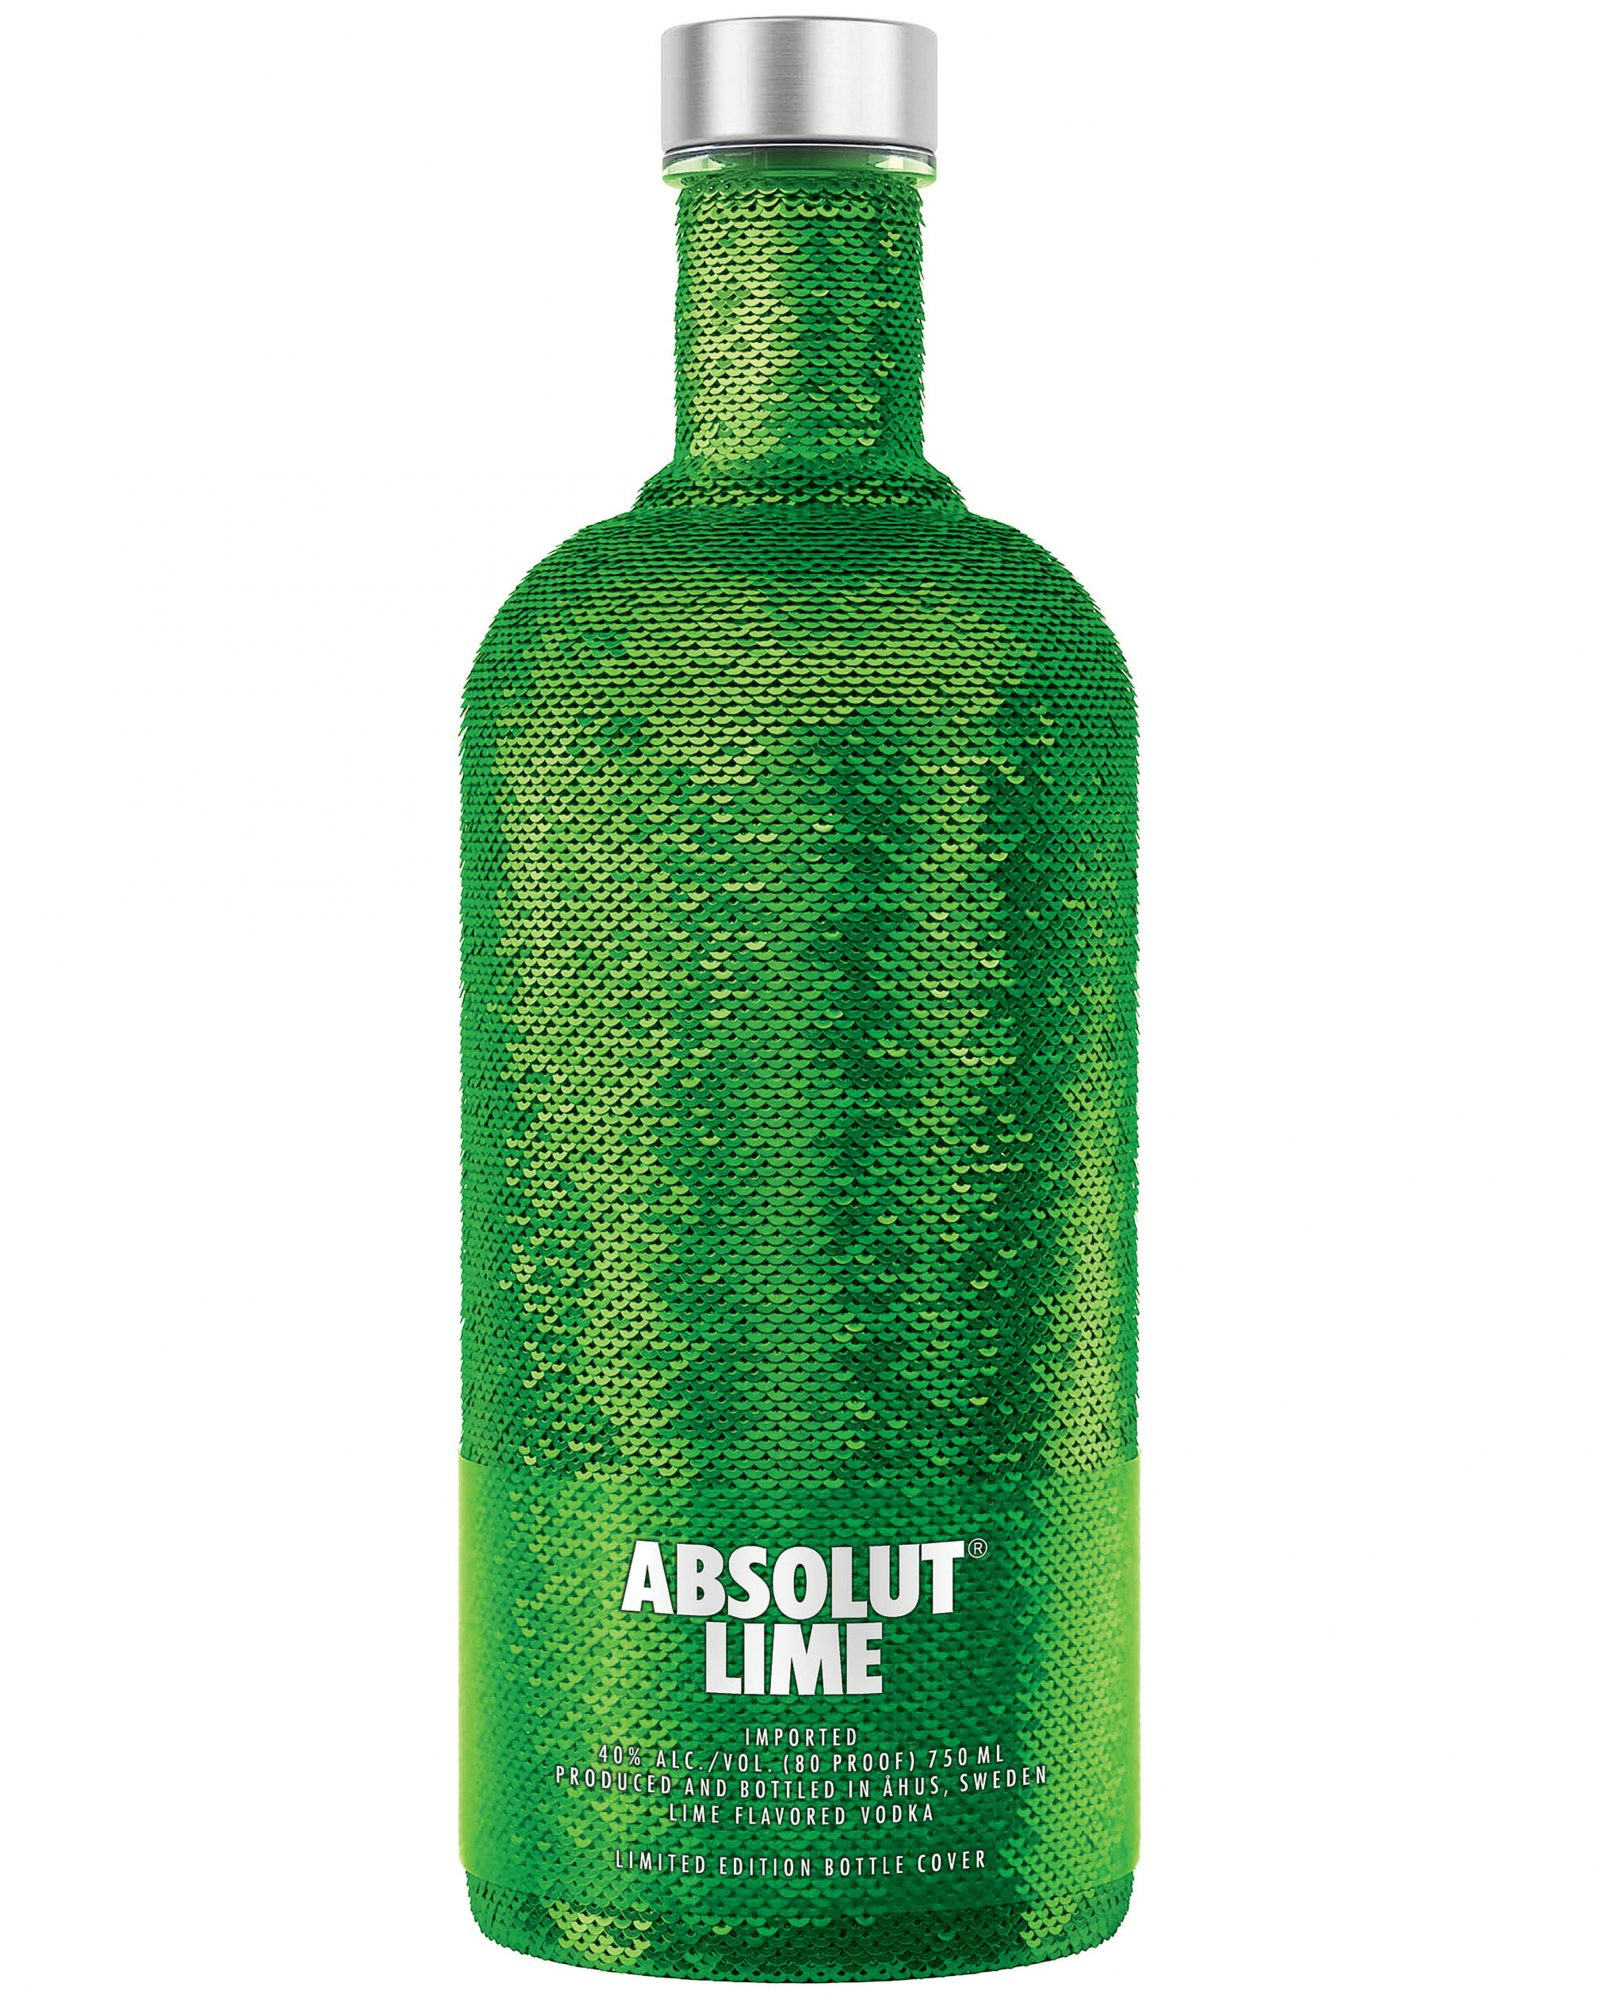 green sequin lime absolut bottle